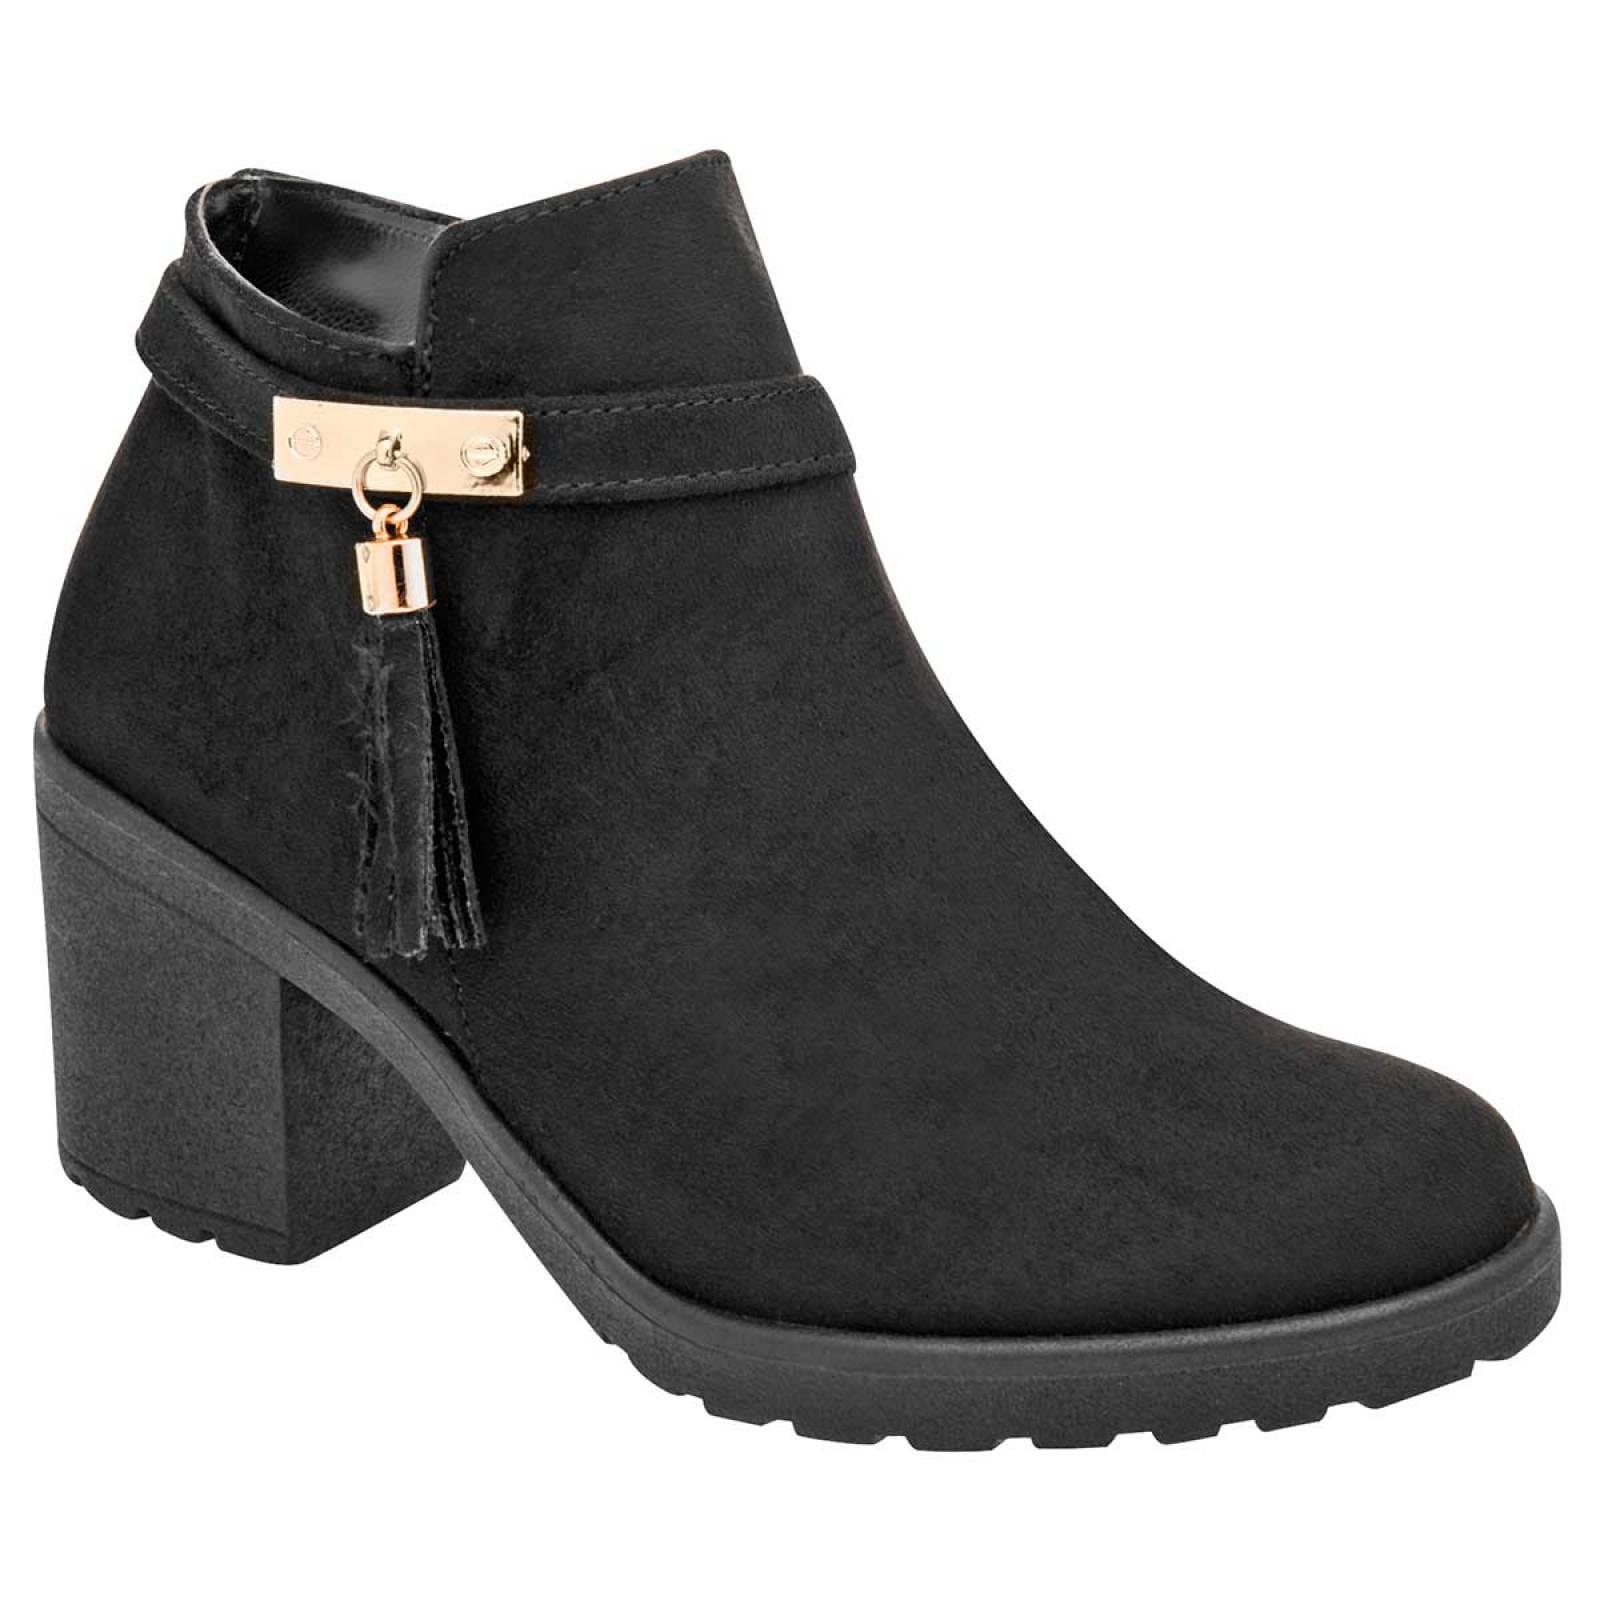 Sexy Girl Zapato para Mujer 98164-1